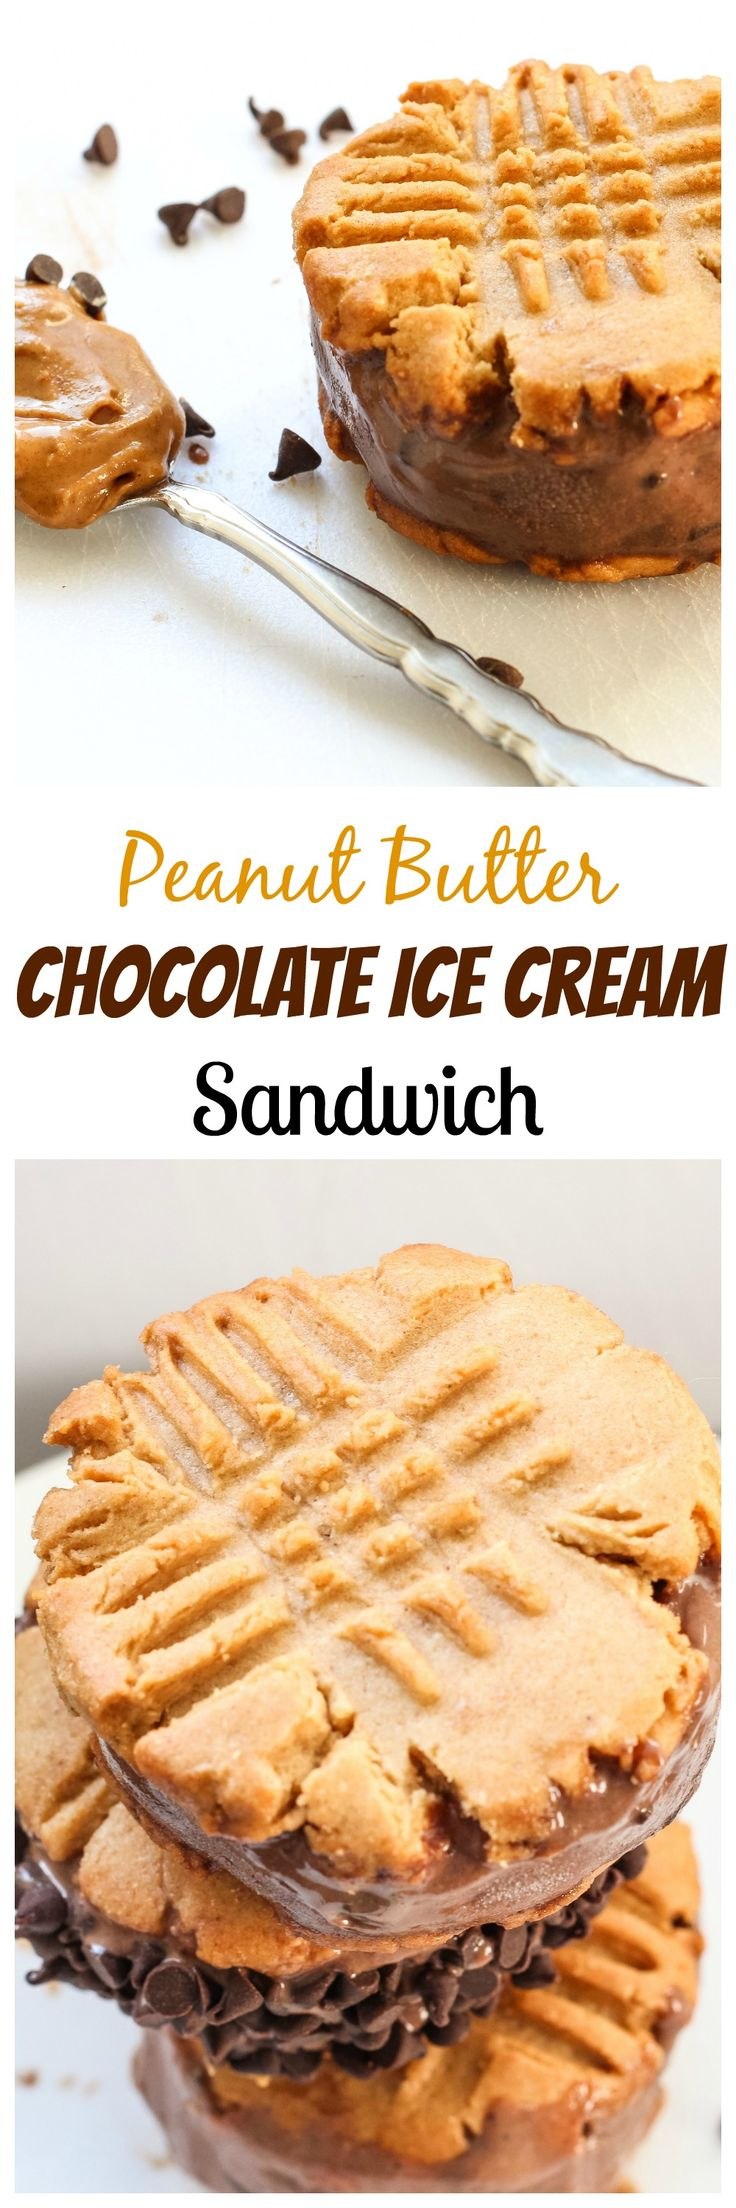 Best 25+ Chocolate ice cream ideas on Pinterest | Homemade ...